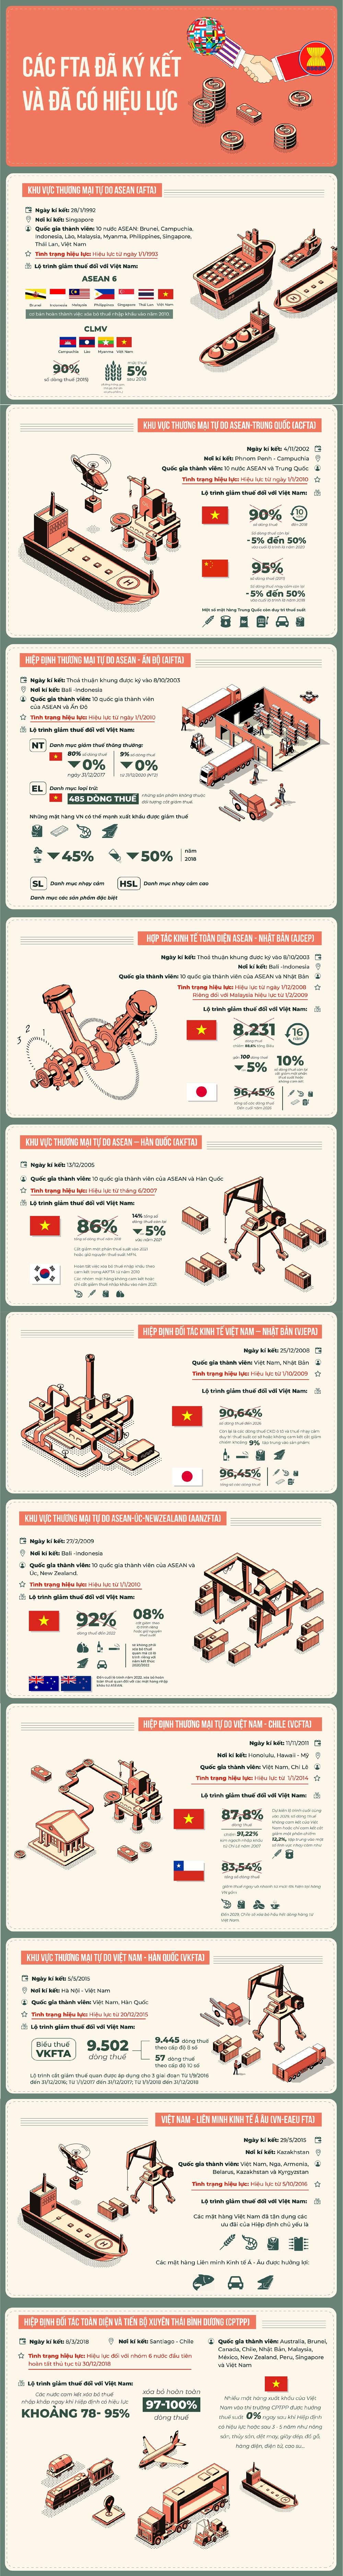 infographic nhung hiep dinh thuong mai tu do viet nam huong loi trong nam 2019